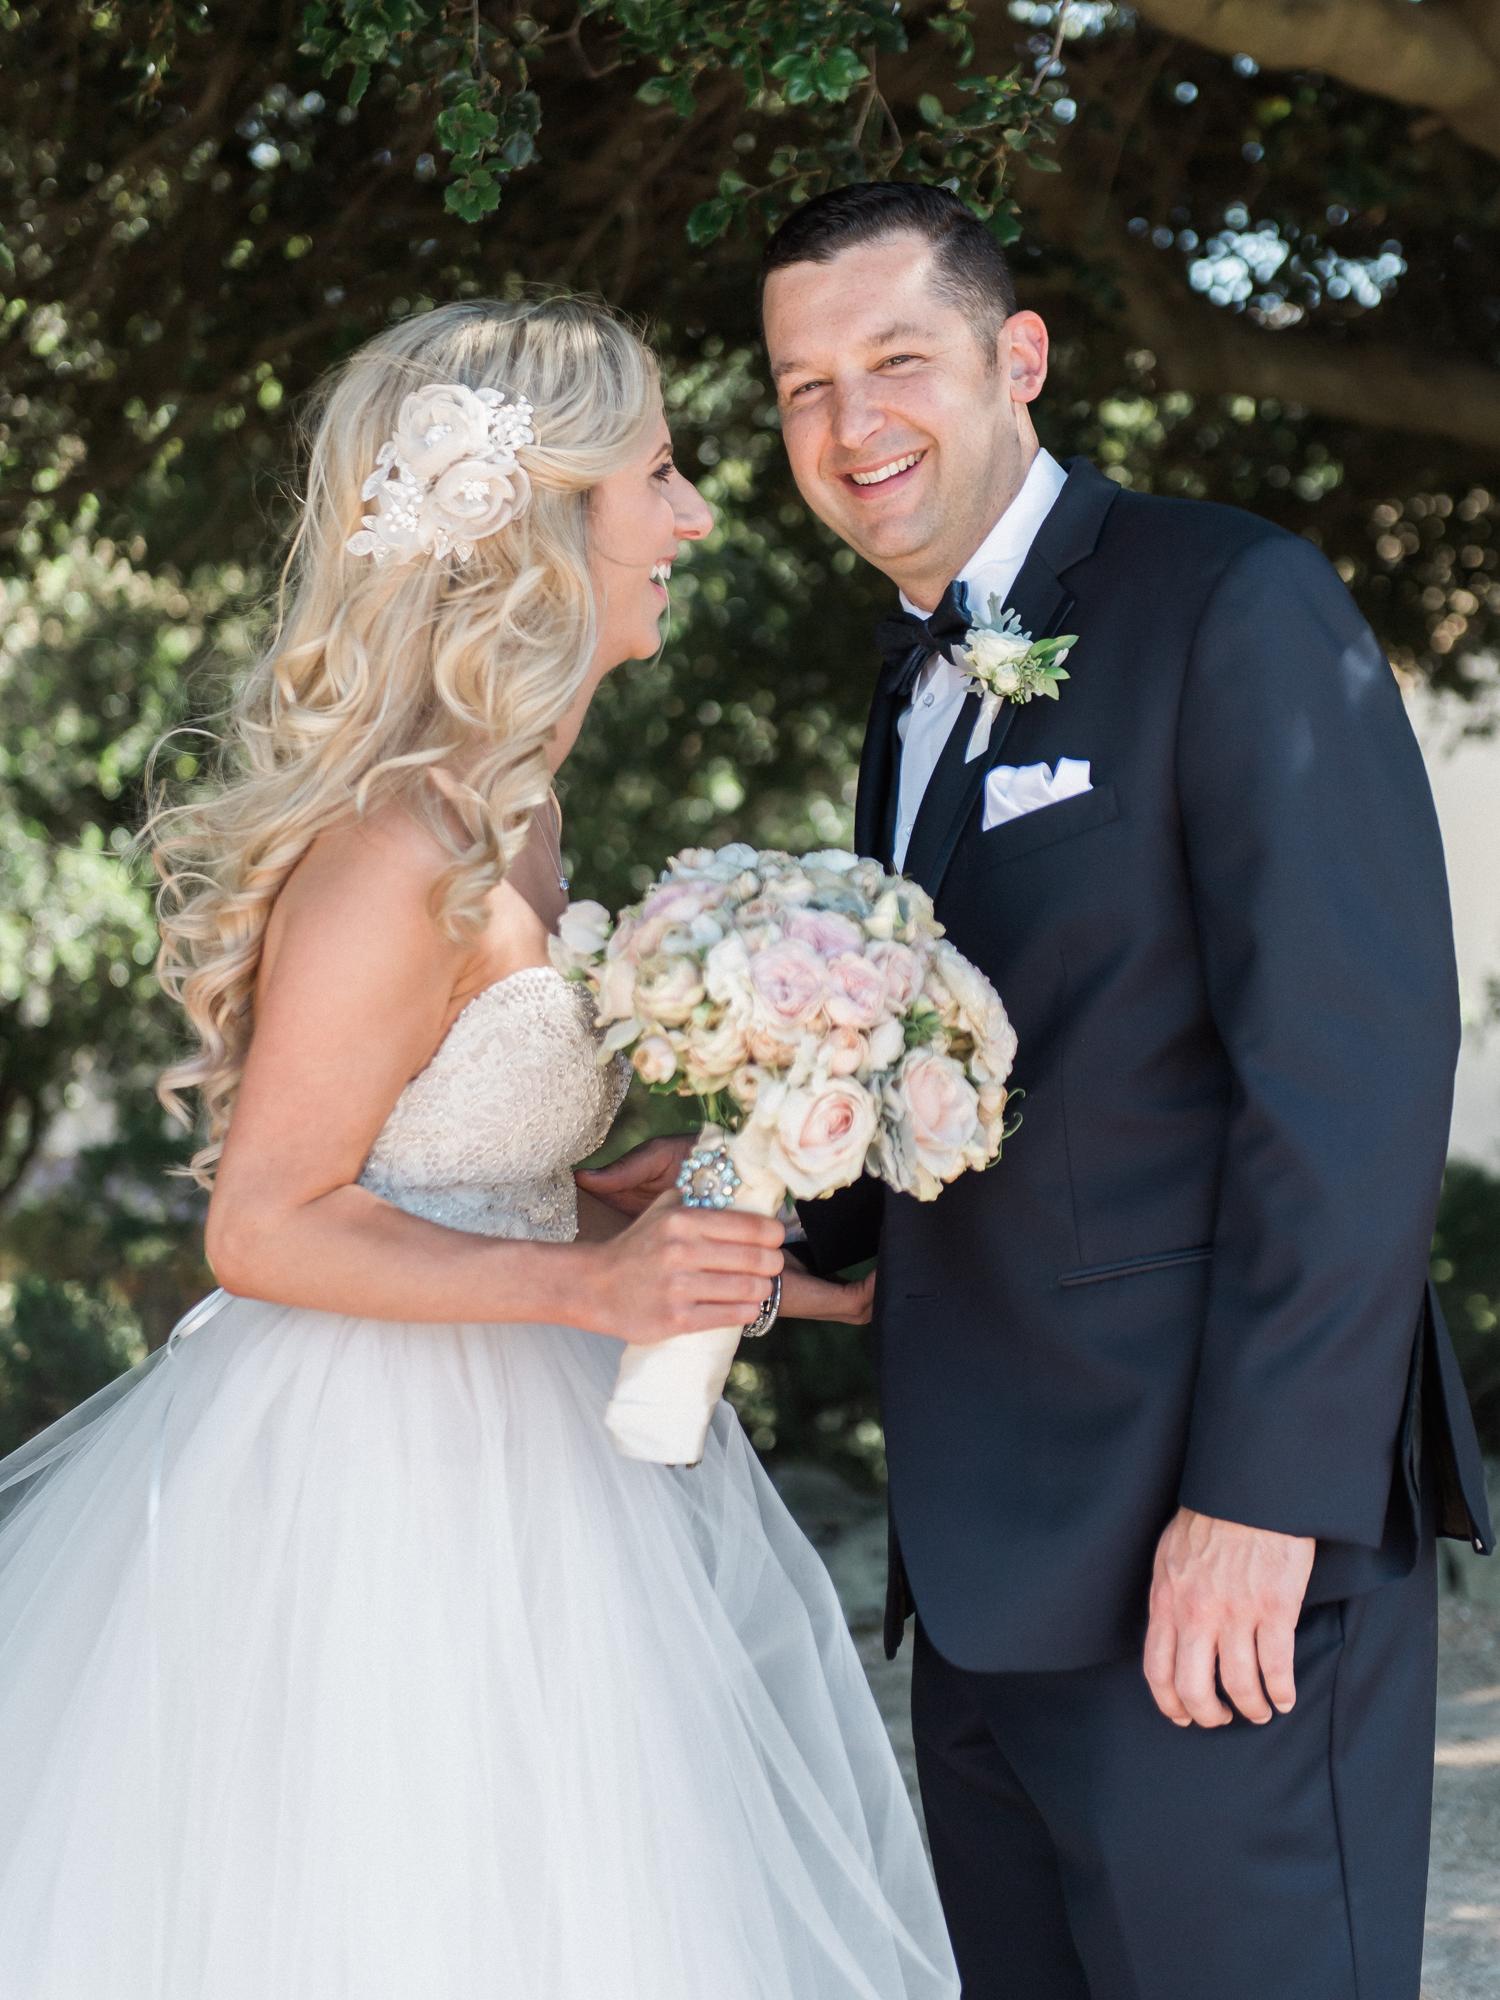 Aimee+Logan_wedding_spp-38.jpg